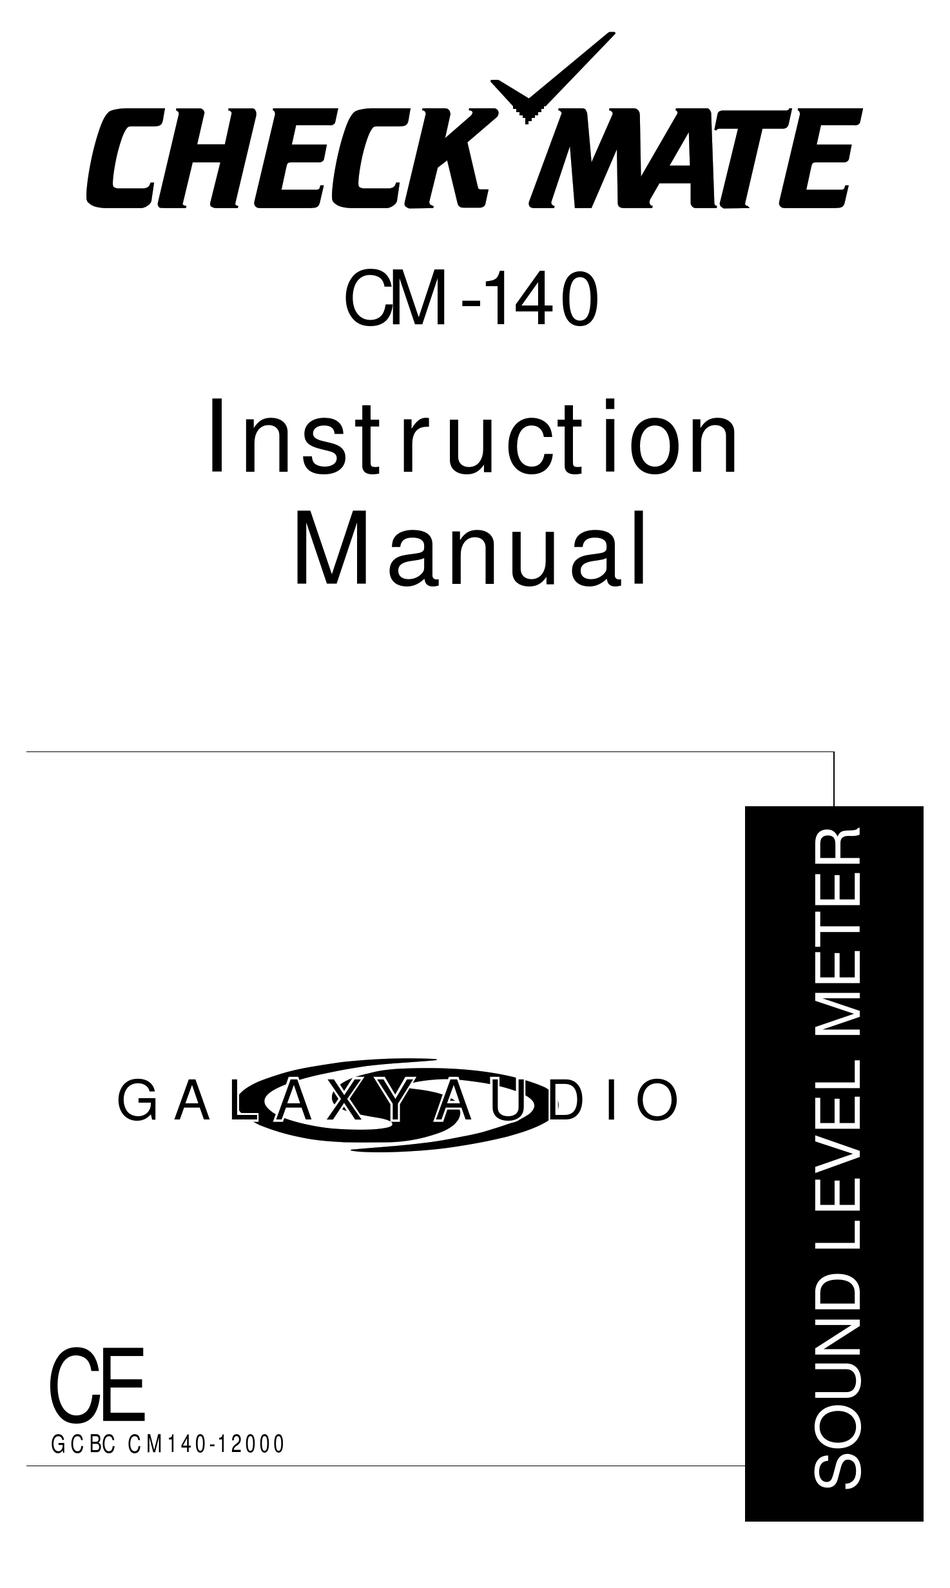 GALAXY AUDIO CHECK-MATE CM-140 INSTRUCTION MANUAL Pdf